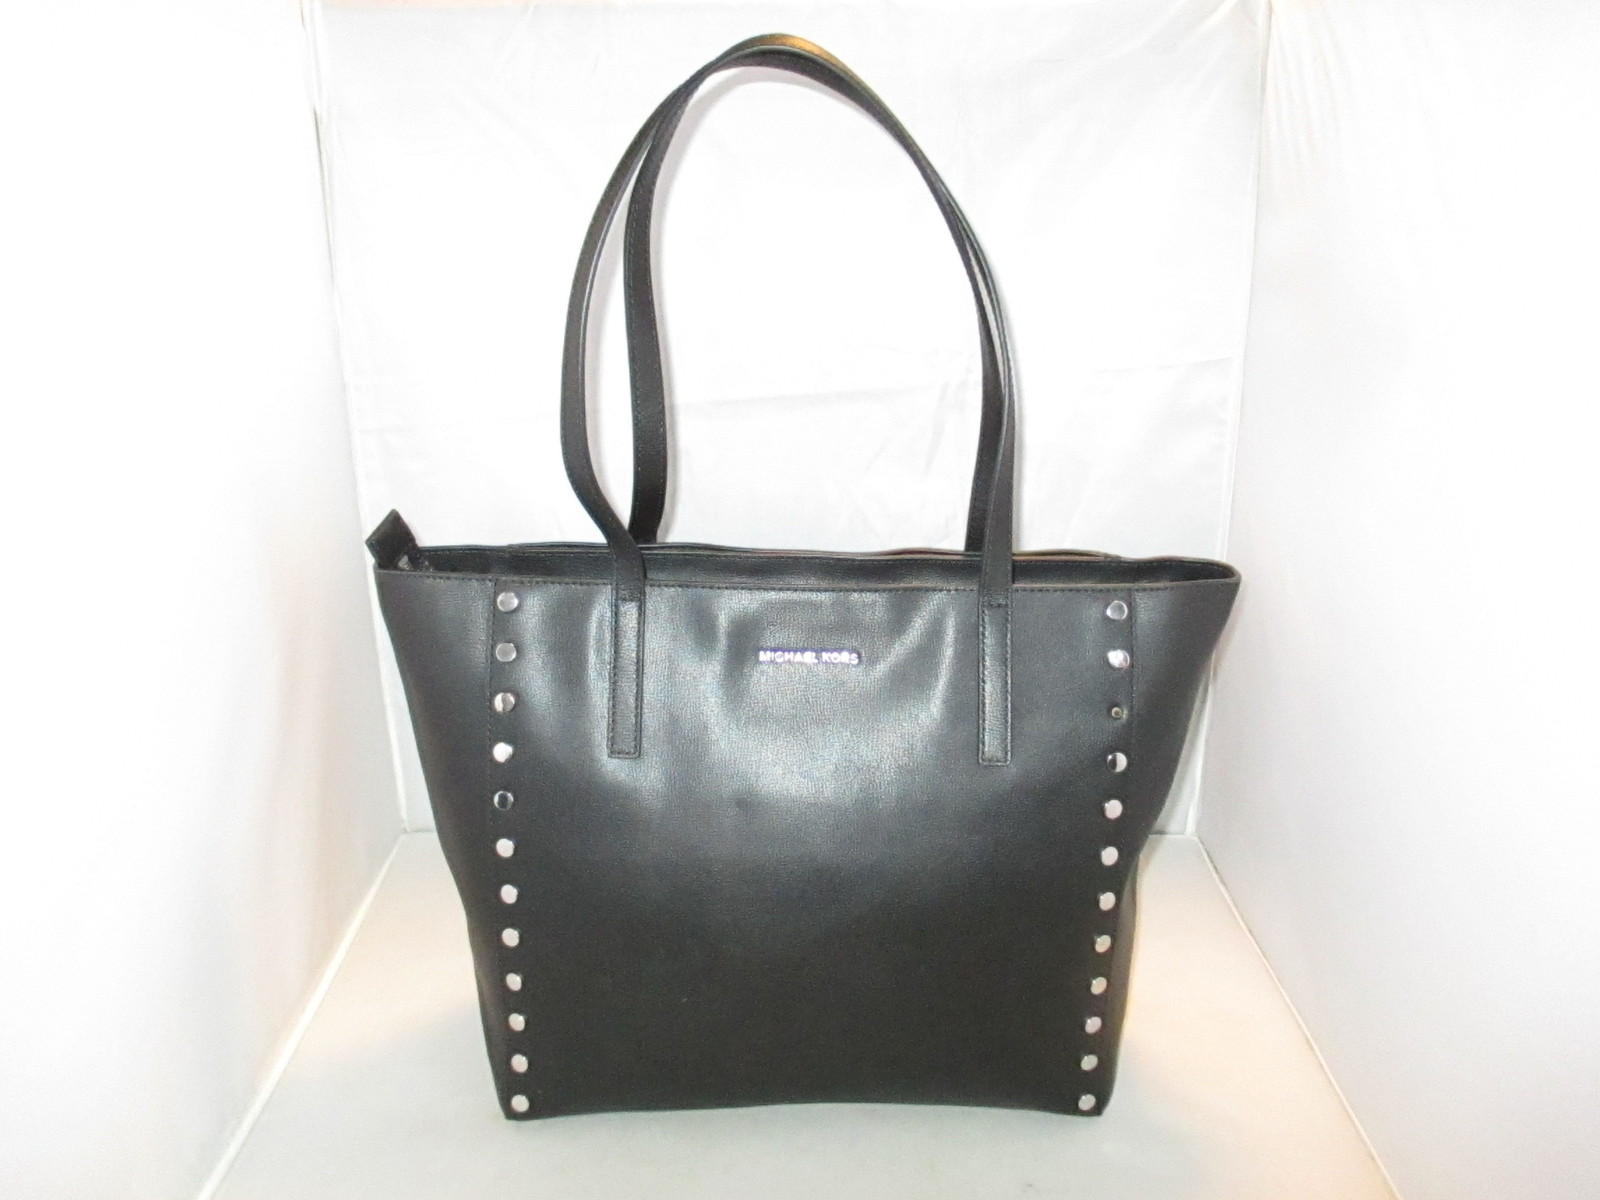 496b6415551a80 Michael Kors Handbag Rivington Stud Large Tote, Shoulder Bag, Satchel $328  Black